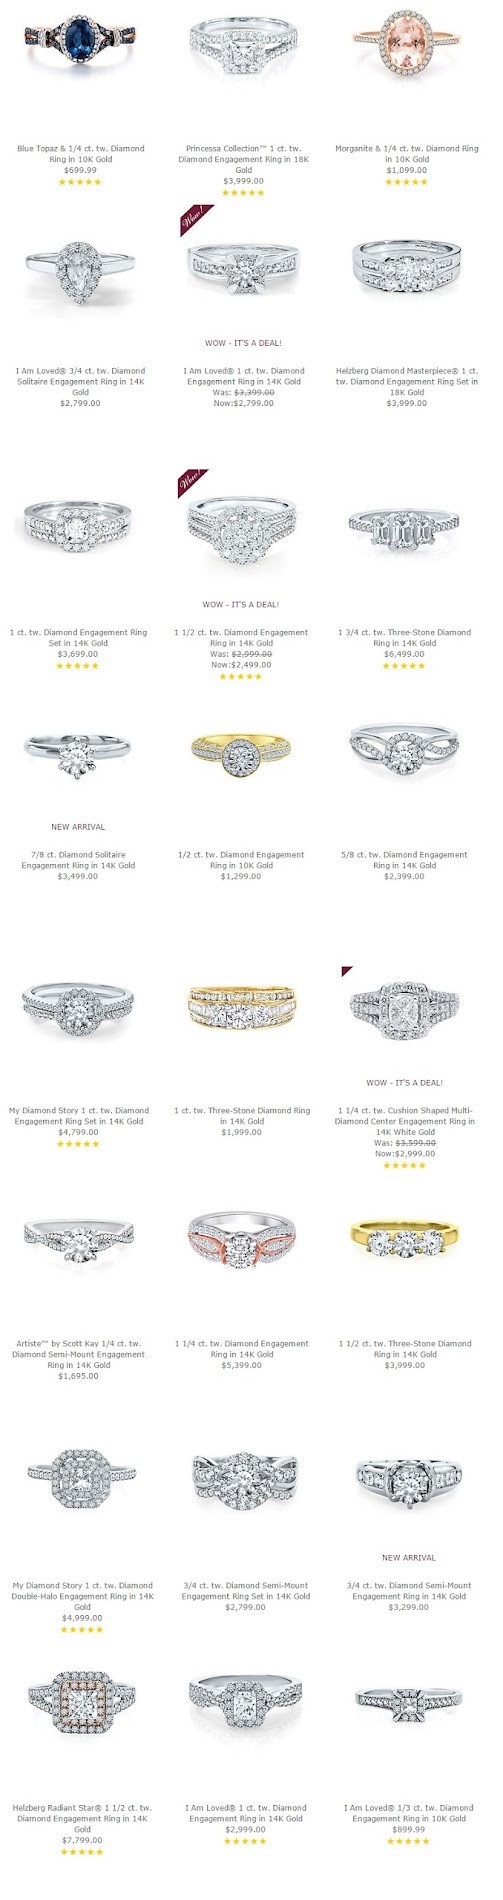 Helzberg Engagement Rings